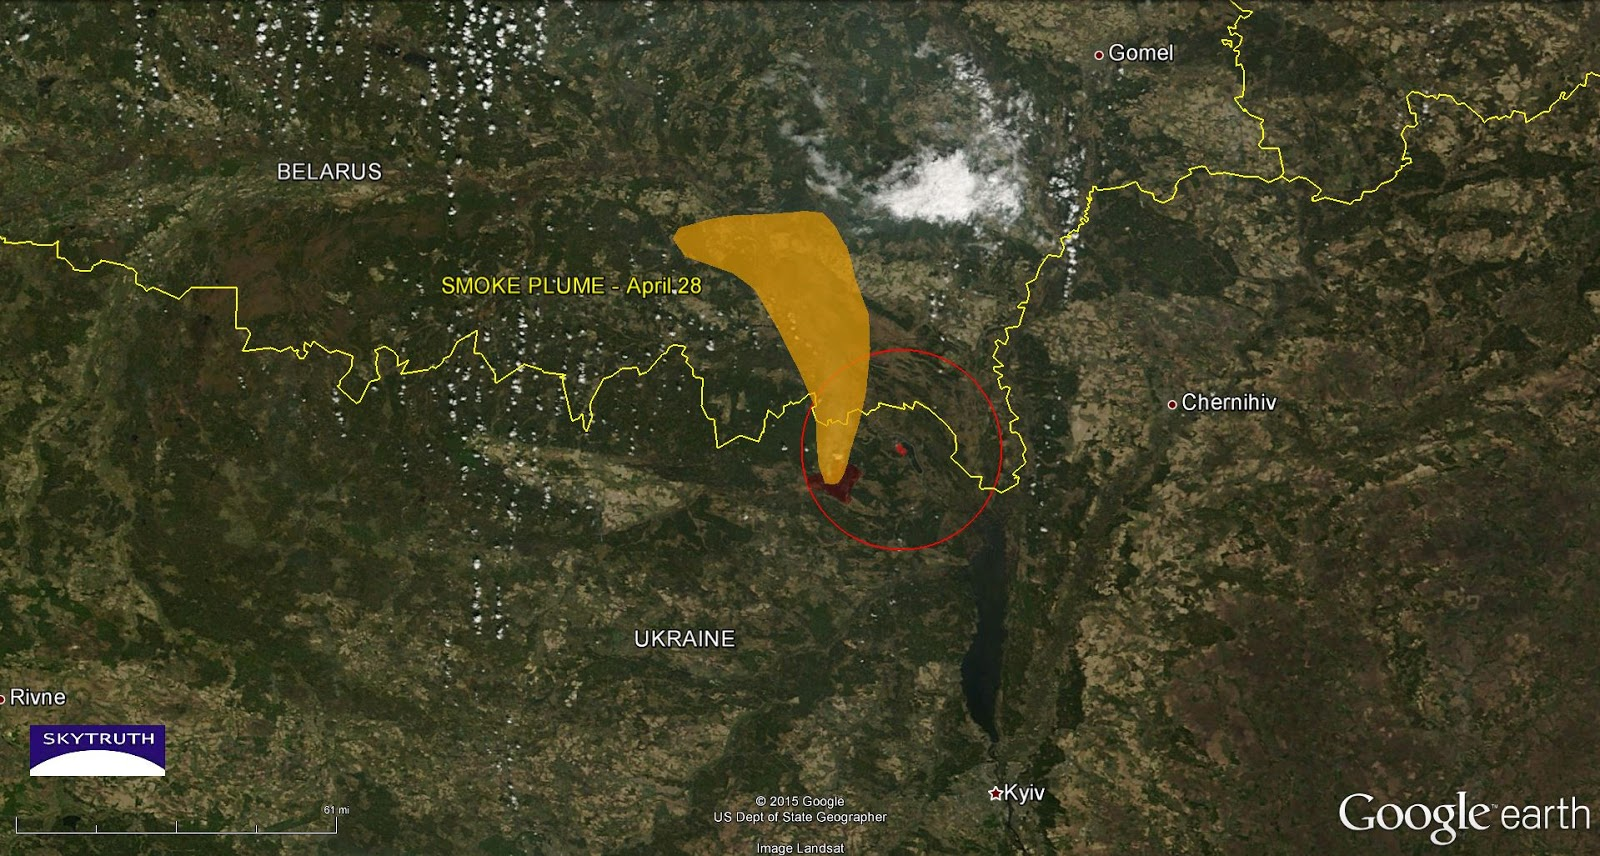 SkyTruth-Chernobyl-wildfire-smoke-plume-28april